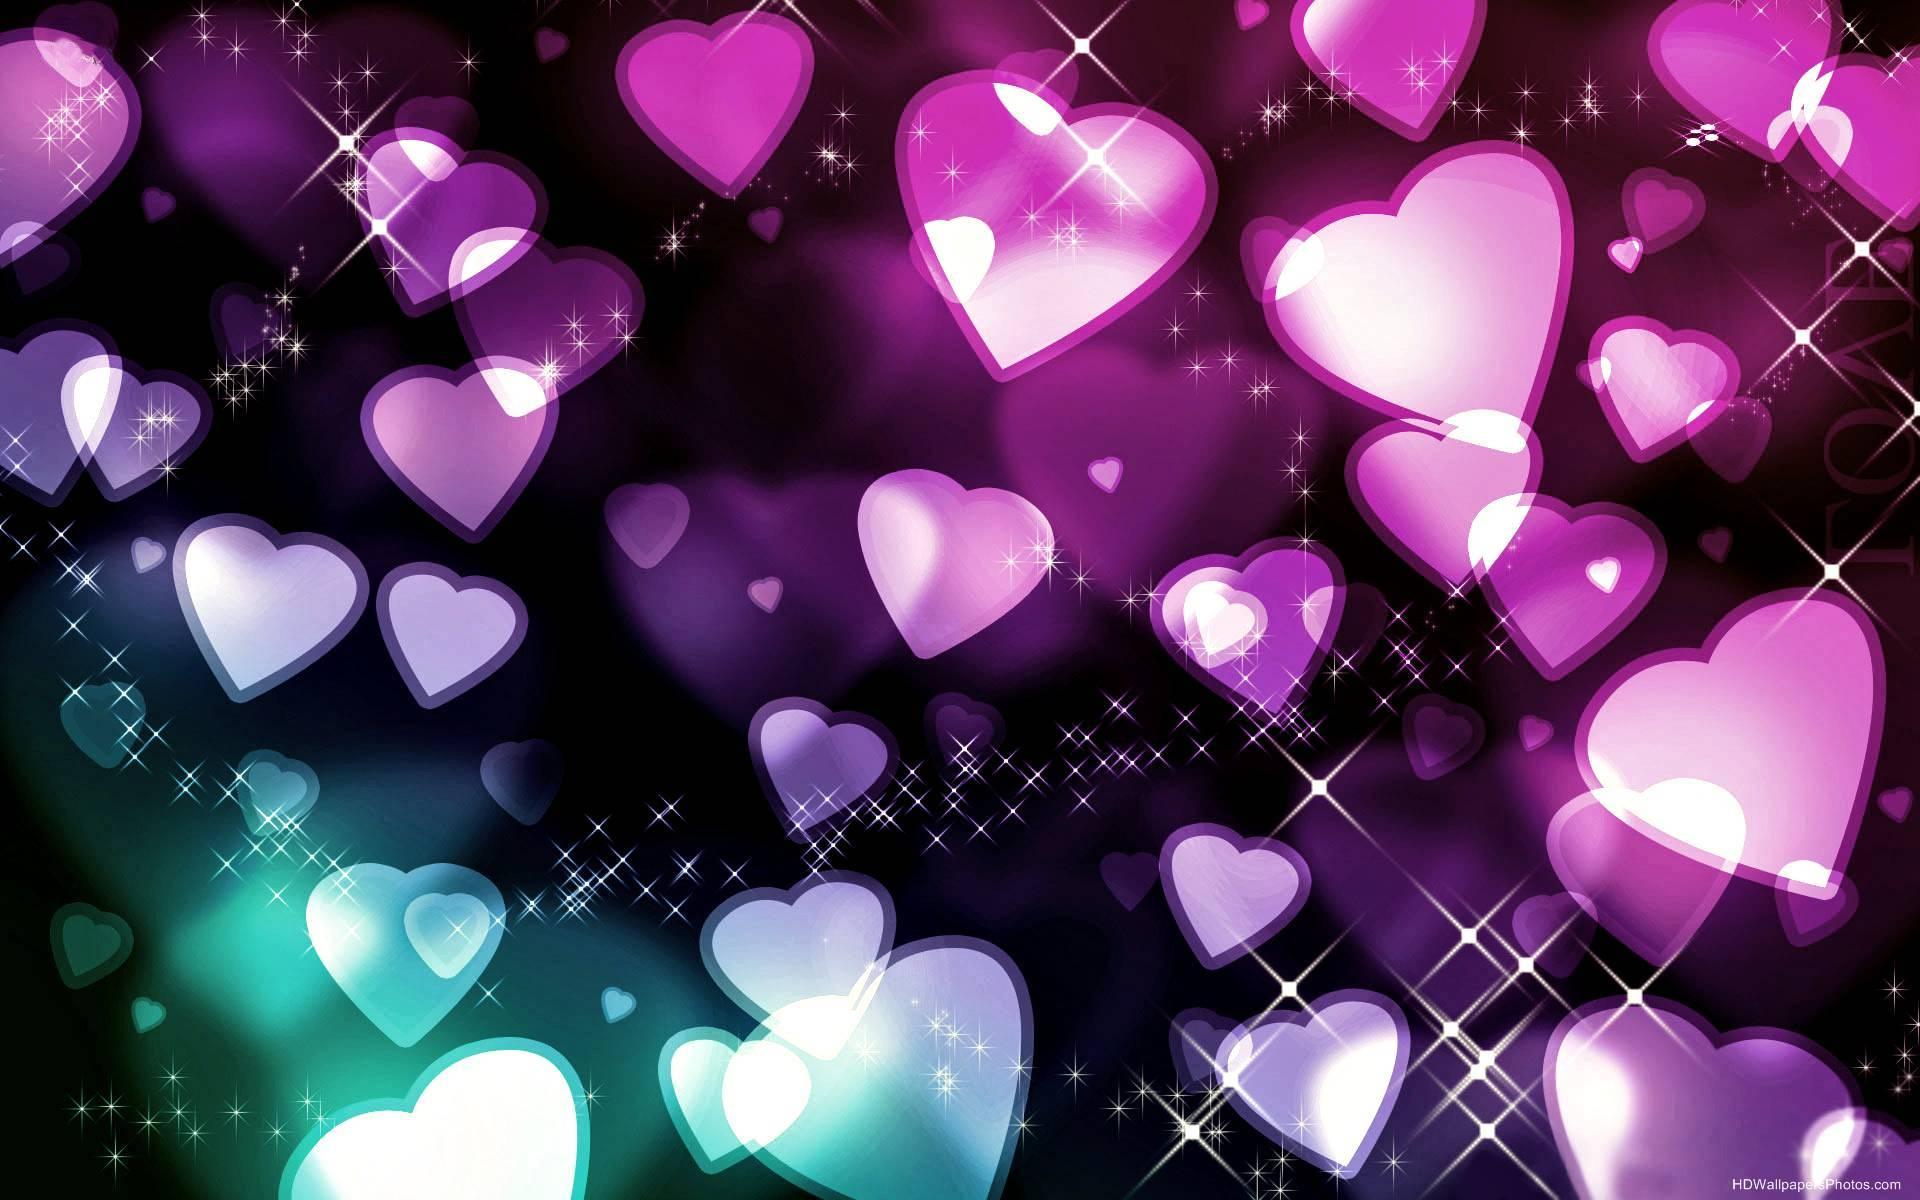 Colorful Hearts Wallpaper